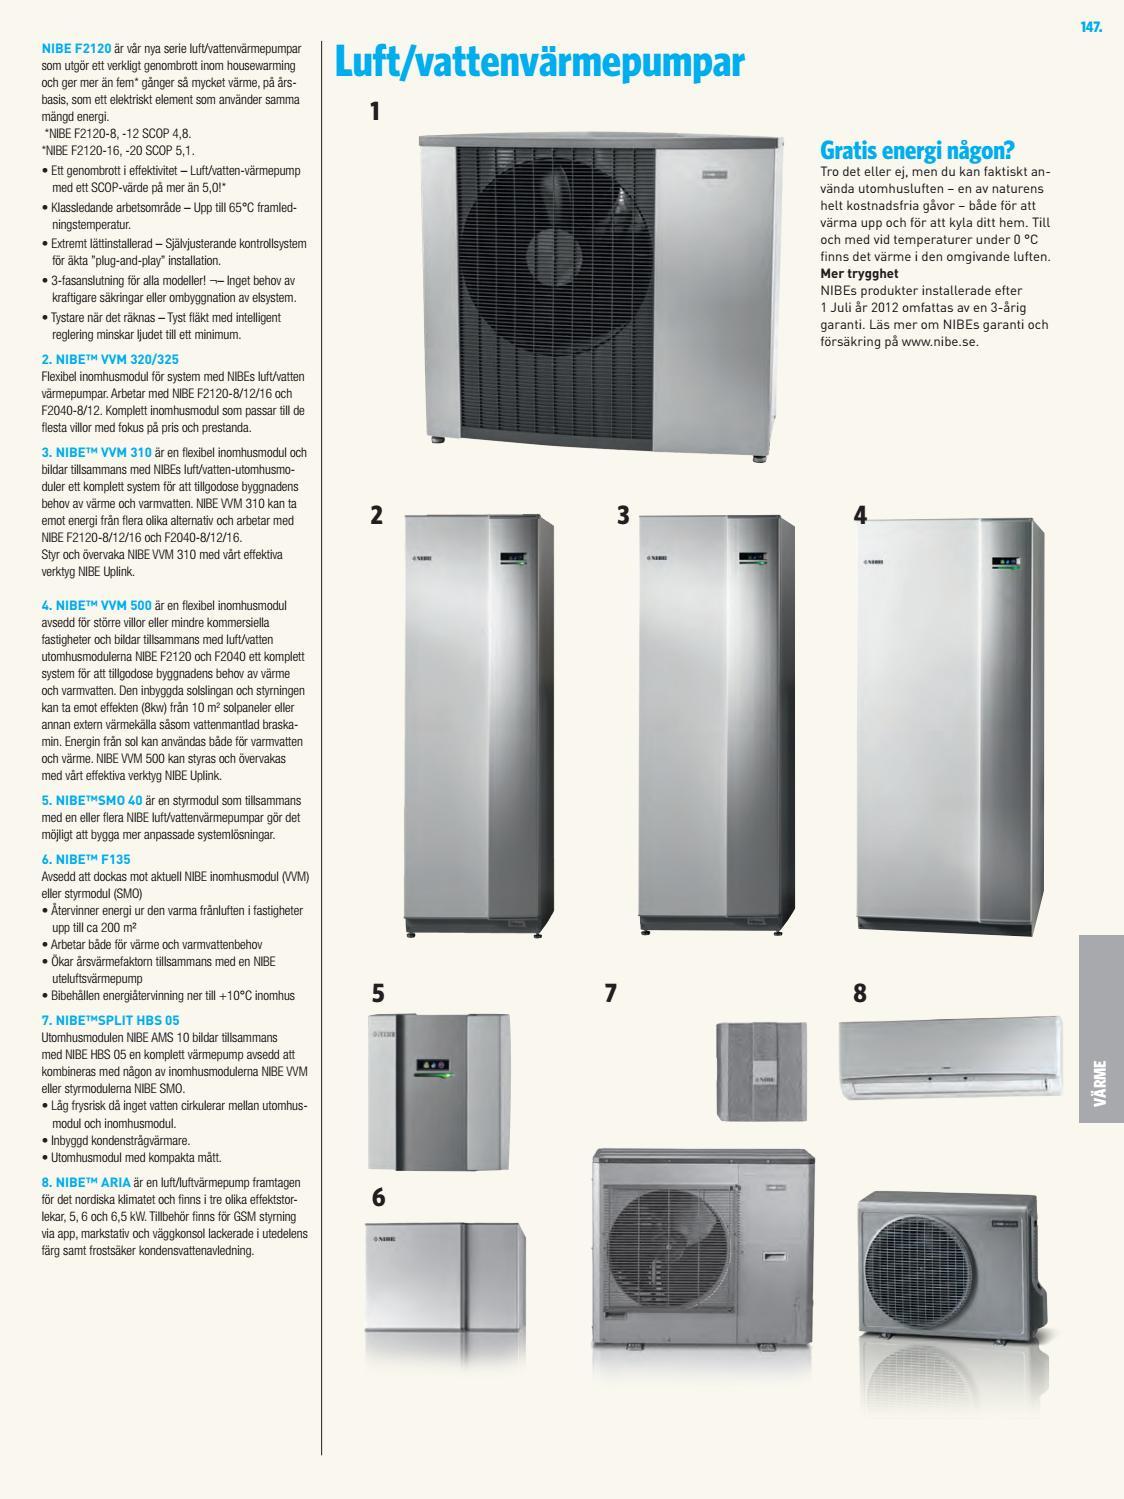 Inredning luft vatten värmepump pris : Bad värme katalog 2017 by Fridholm & Partners - issuu